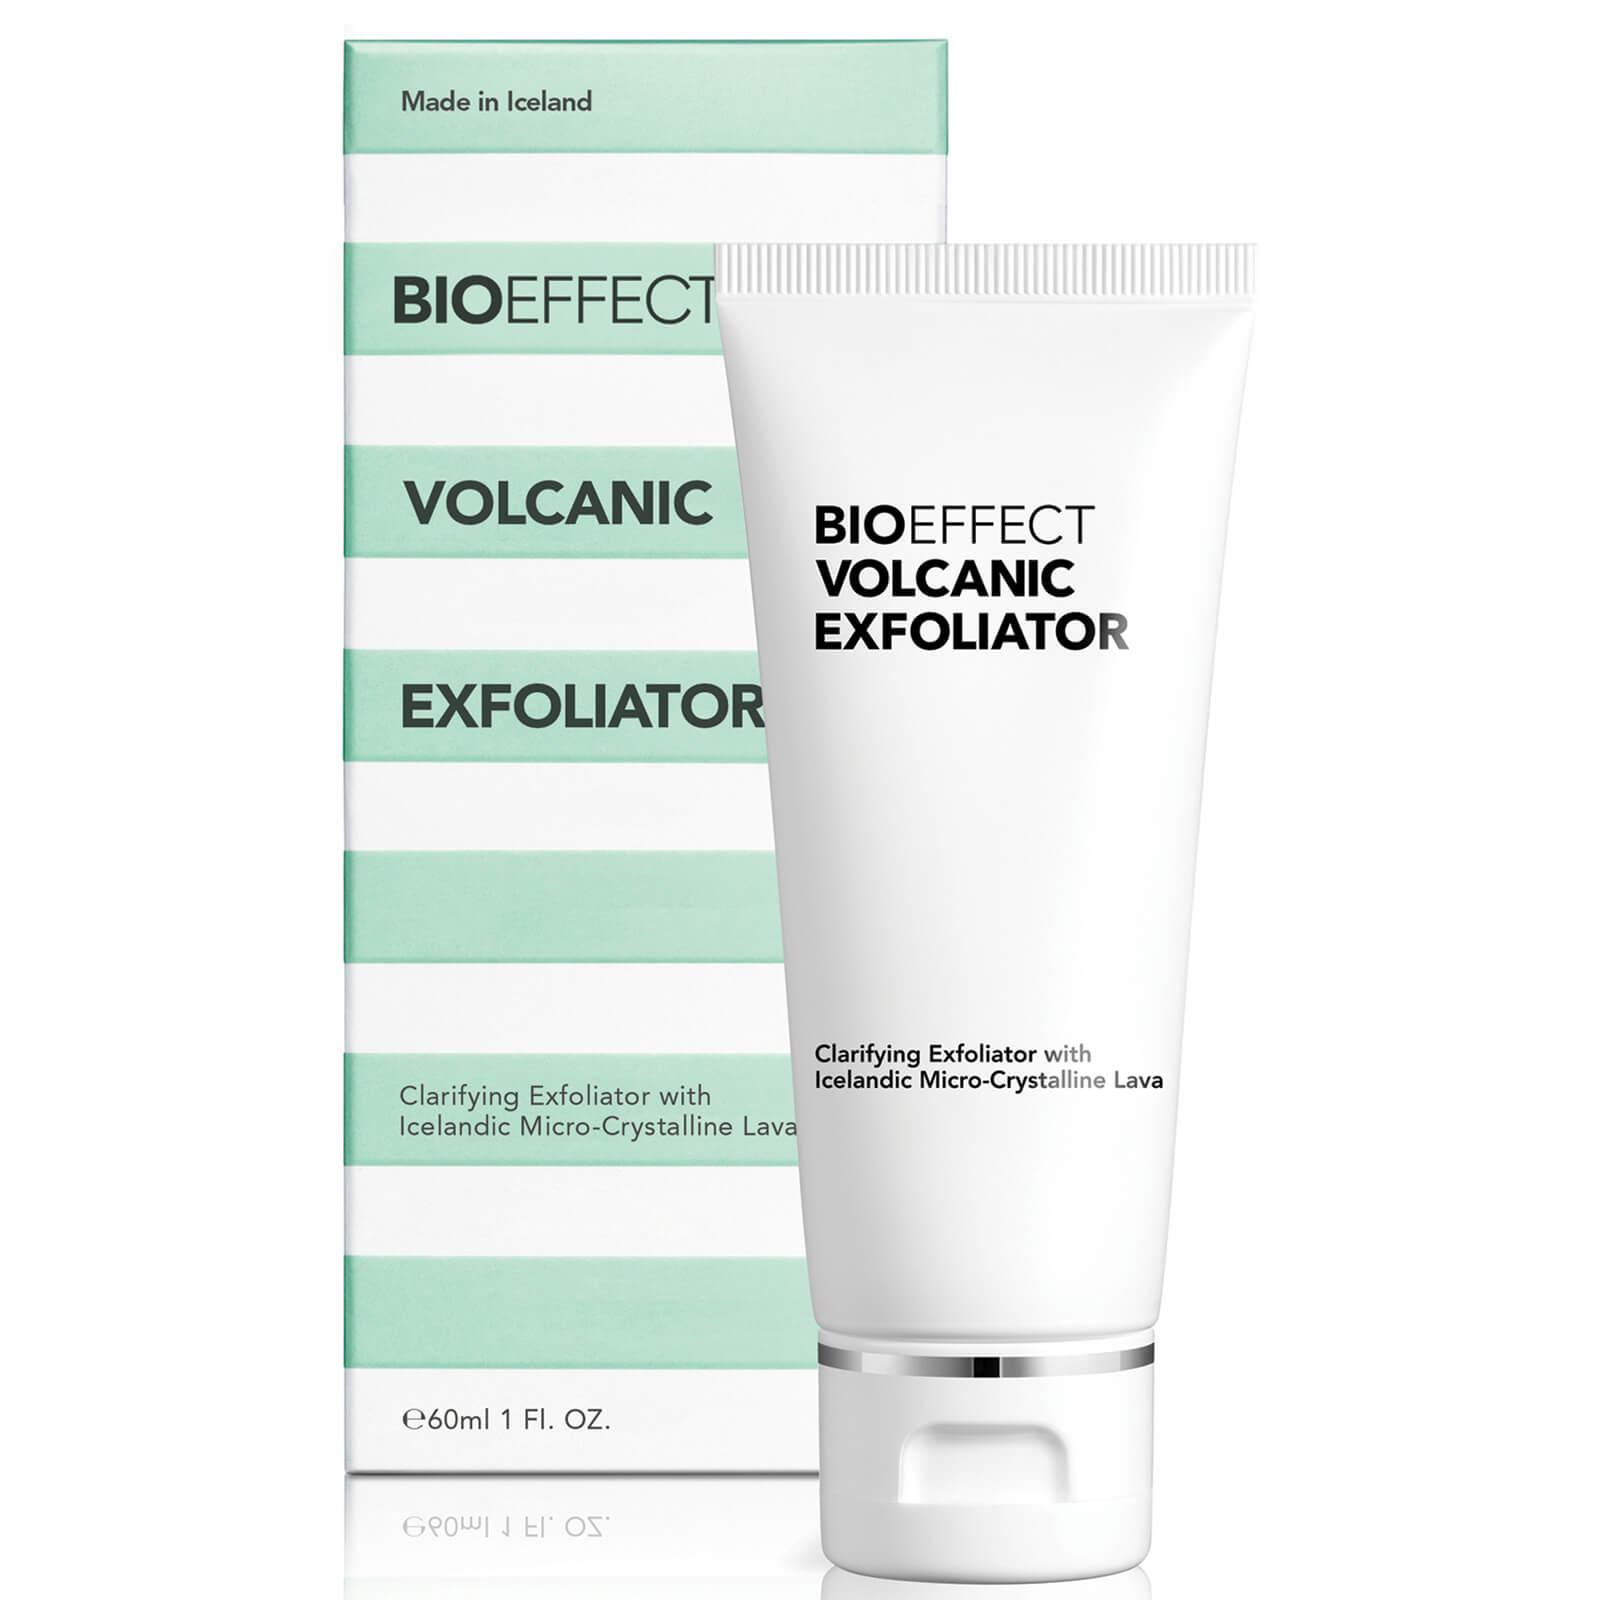 BIOEFFECT Volcanic Ash Exfoliator 60ml